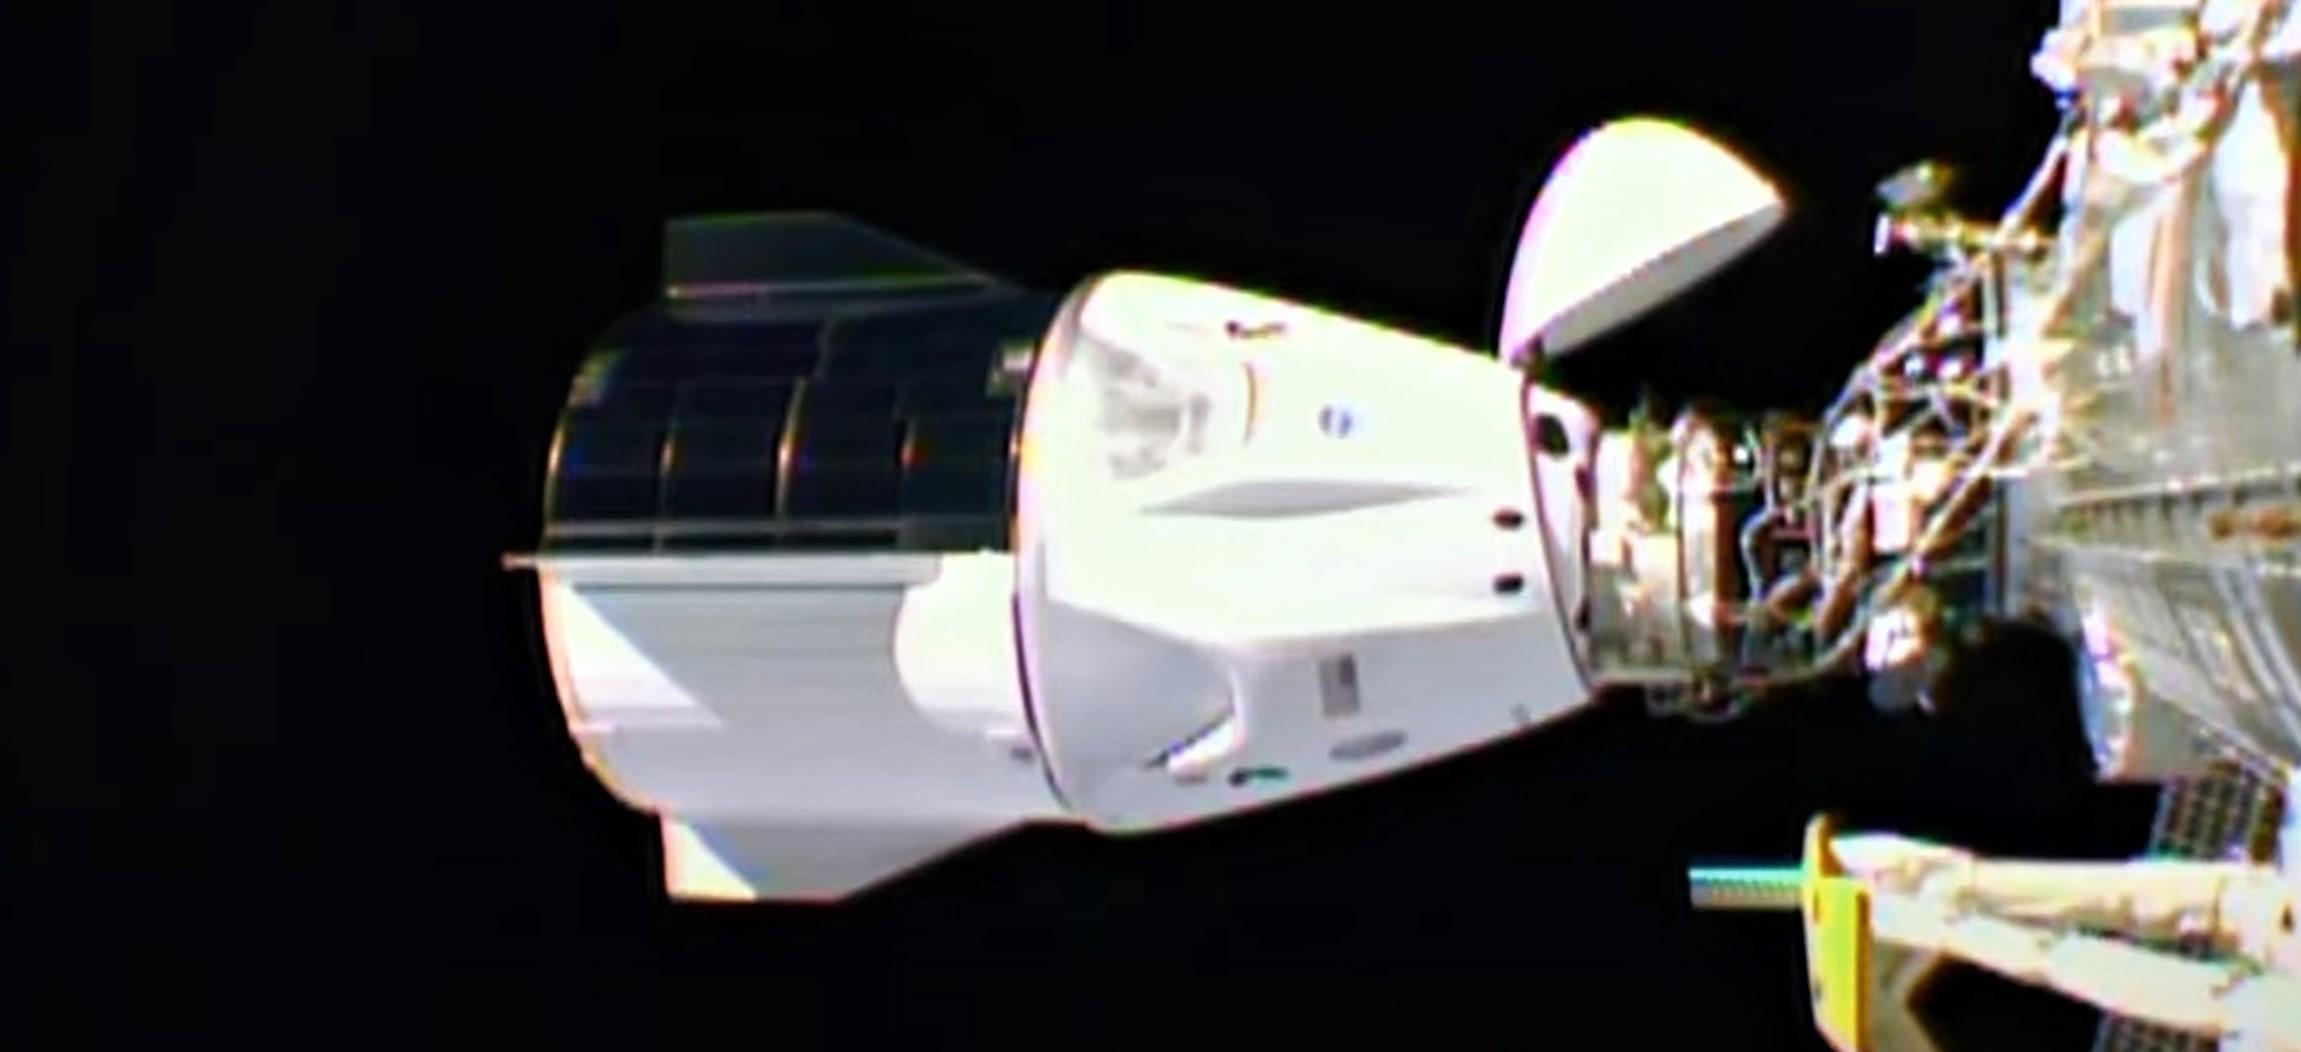 Crew-1 Crew Dragon C207 webcast 111620 (NASA) ISS docked 2